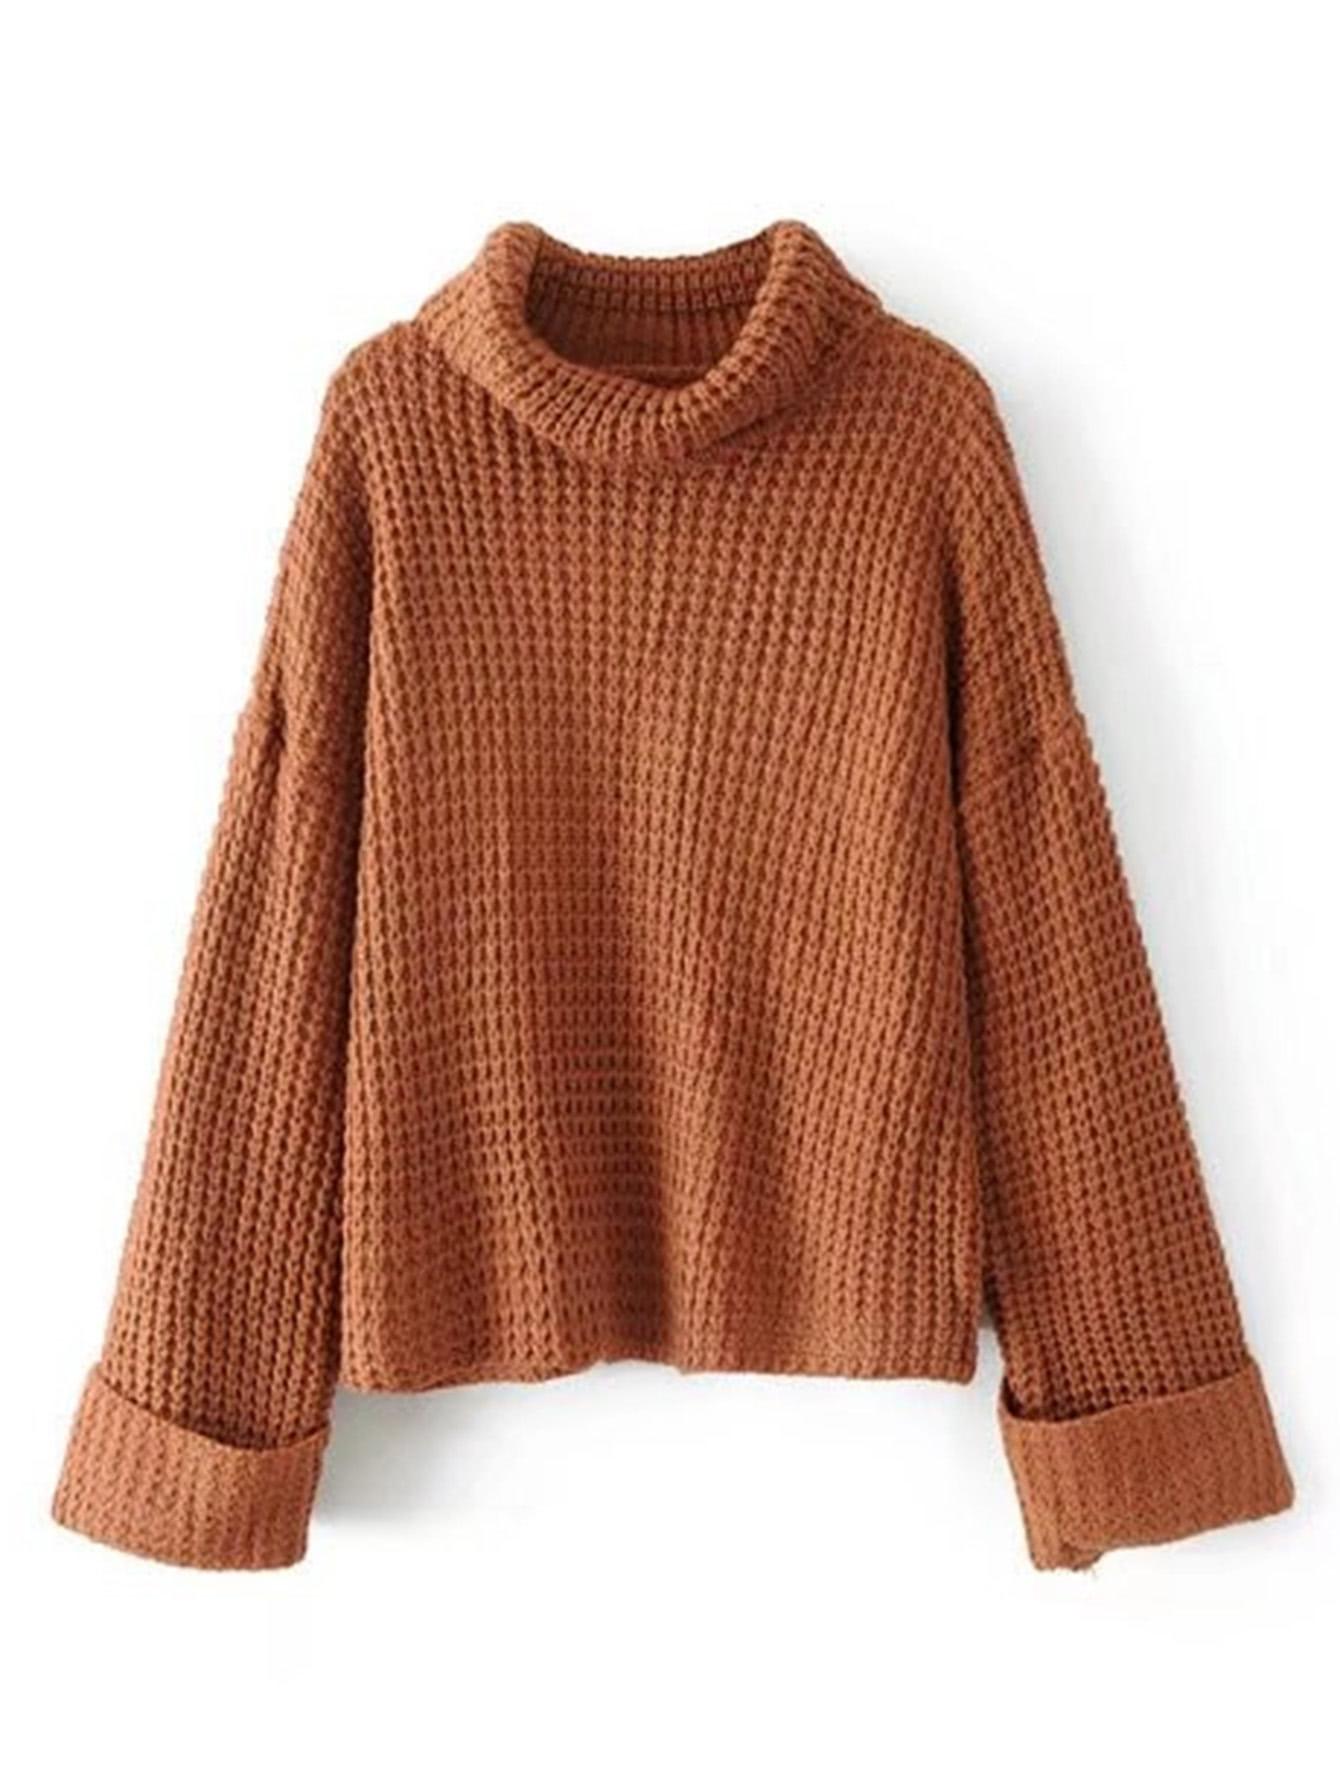 turtleneck waffle knit sweater iwfamfm